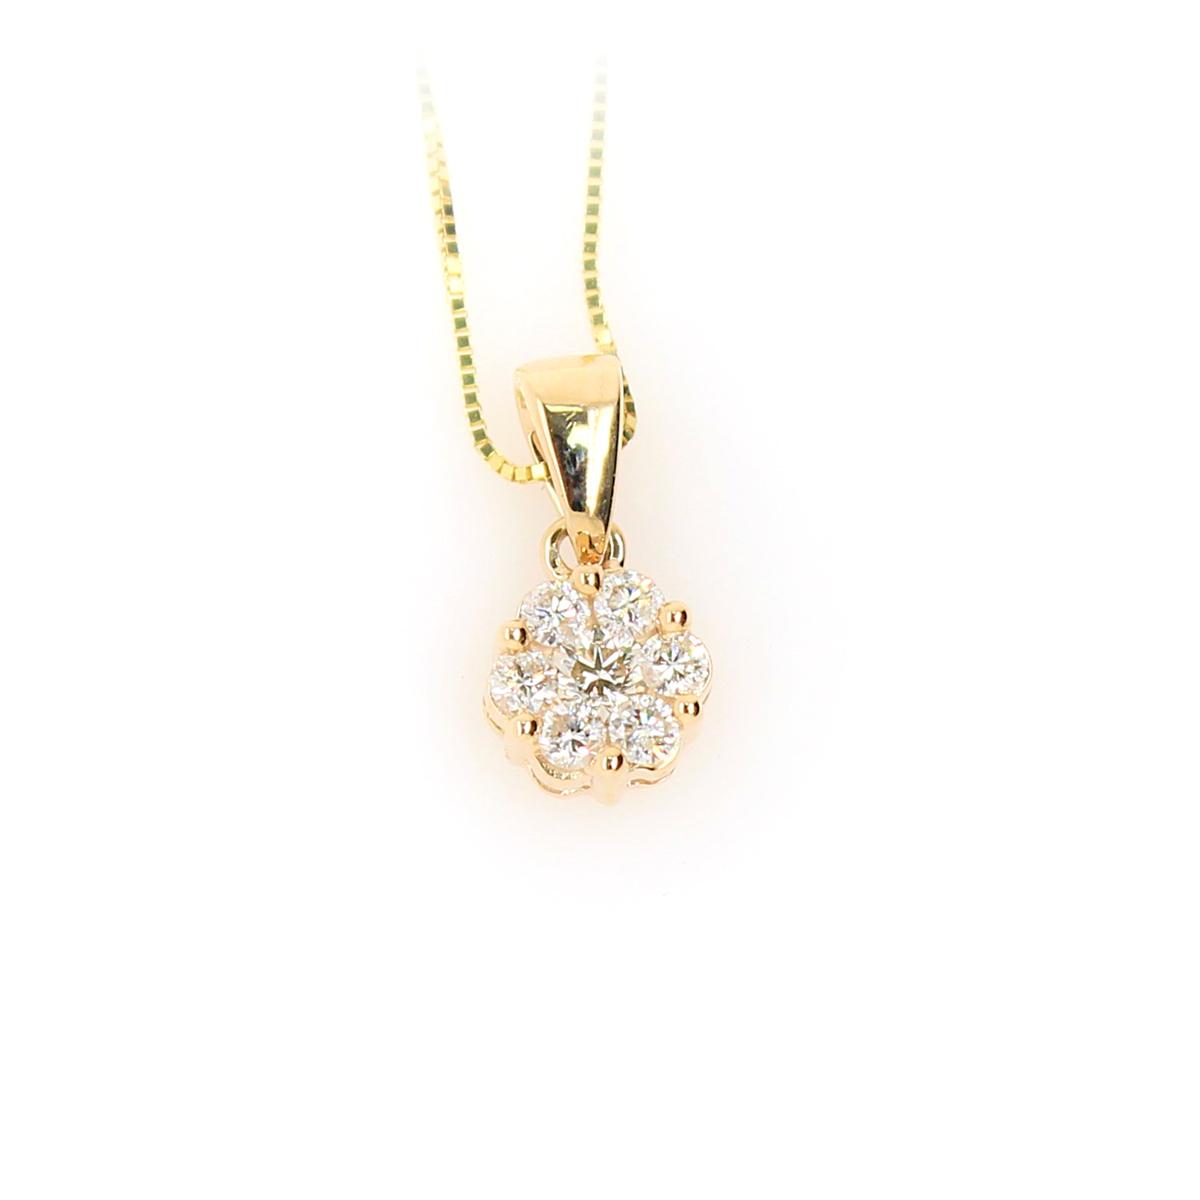 Shefi Diamonds 10 Karat Yellow Gold 1.5 Carat Cluster Diamond Pendant Necklace